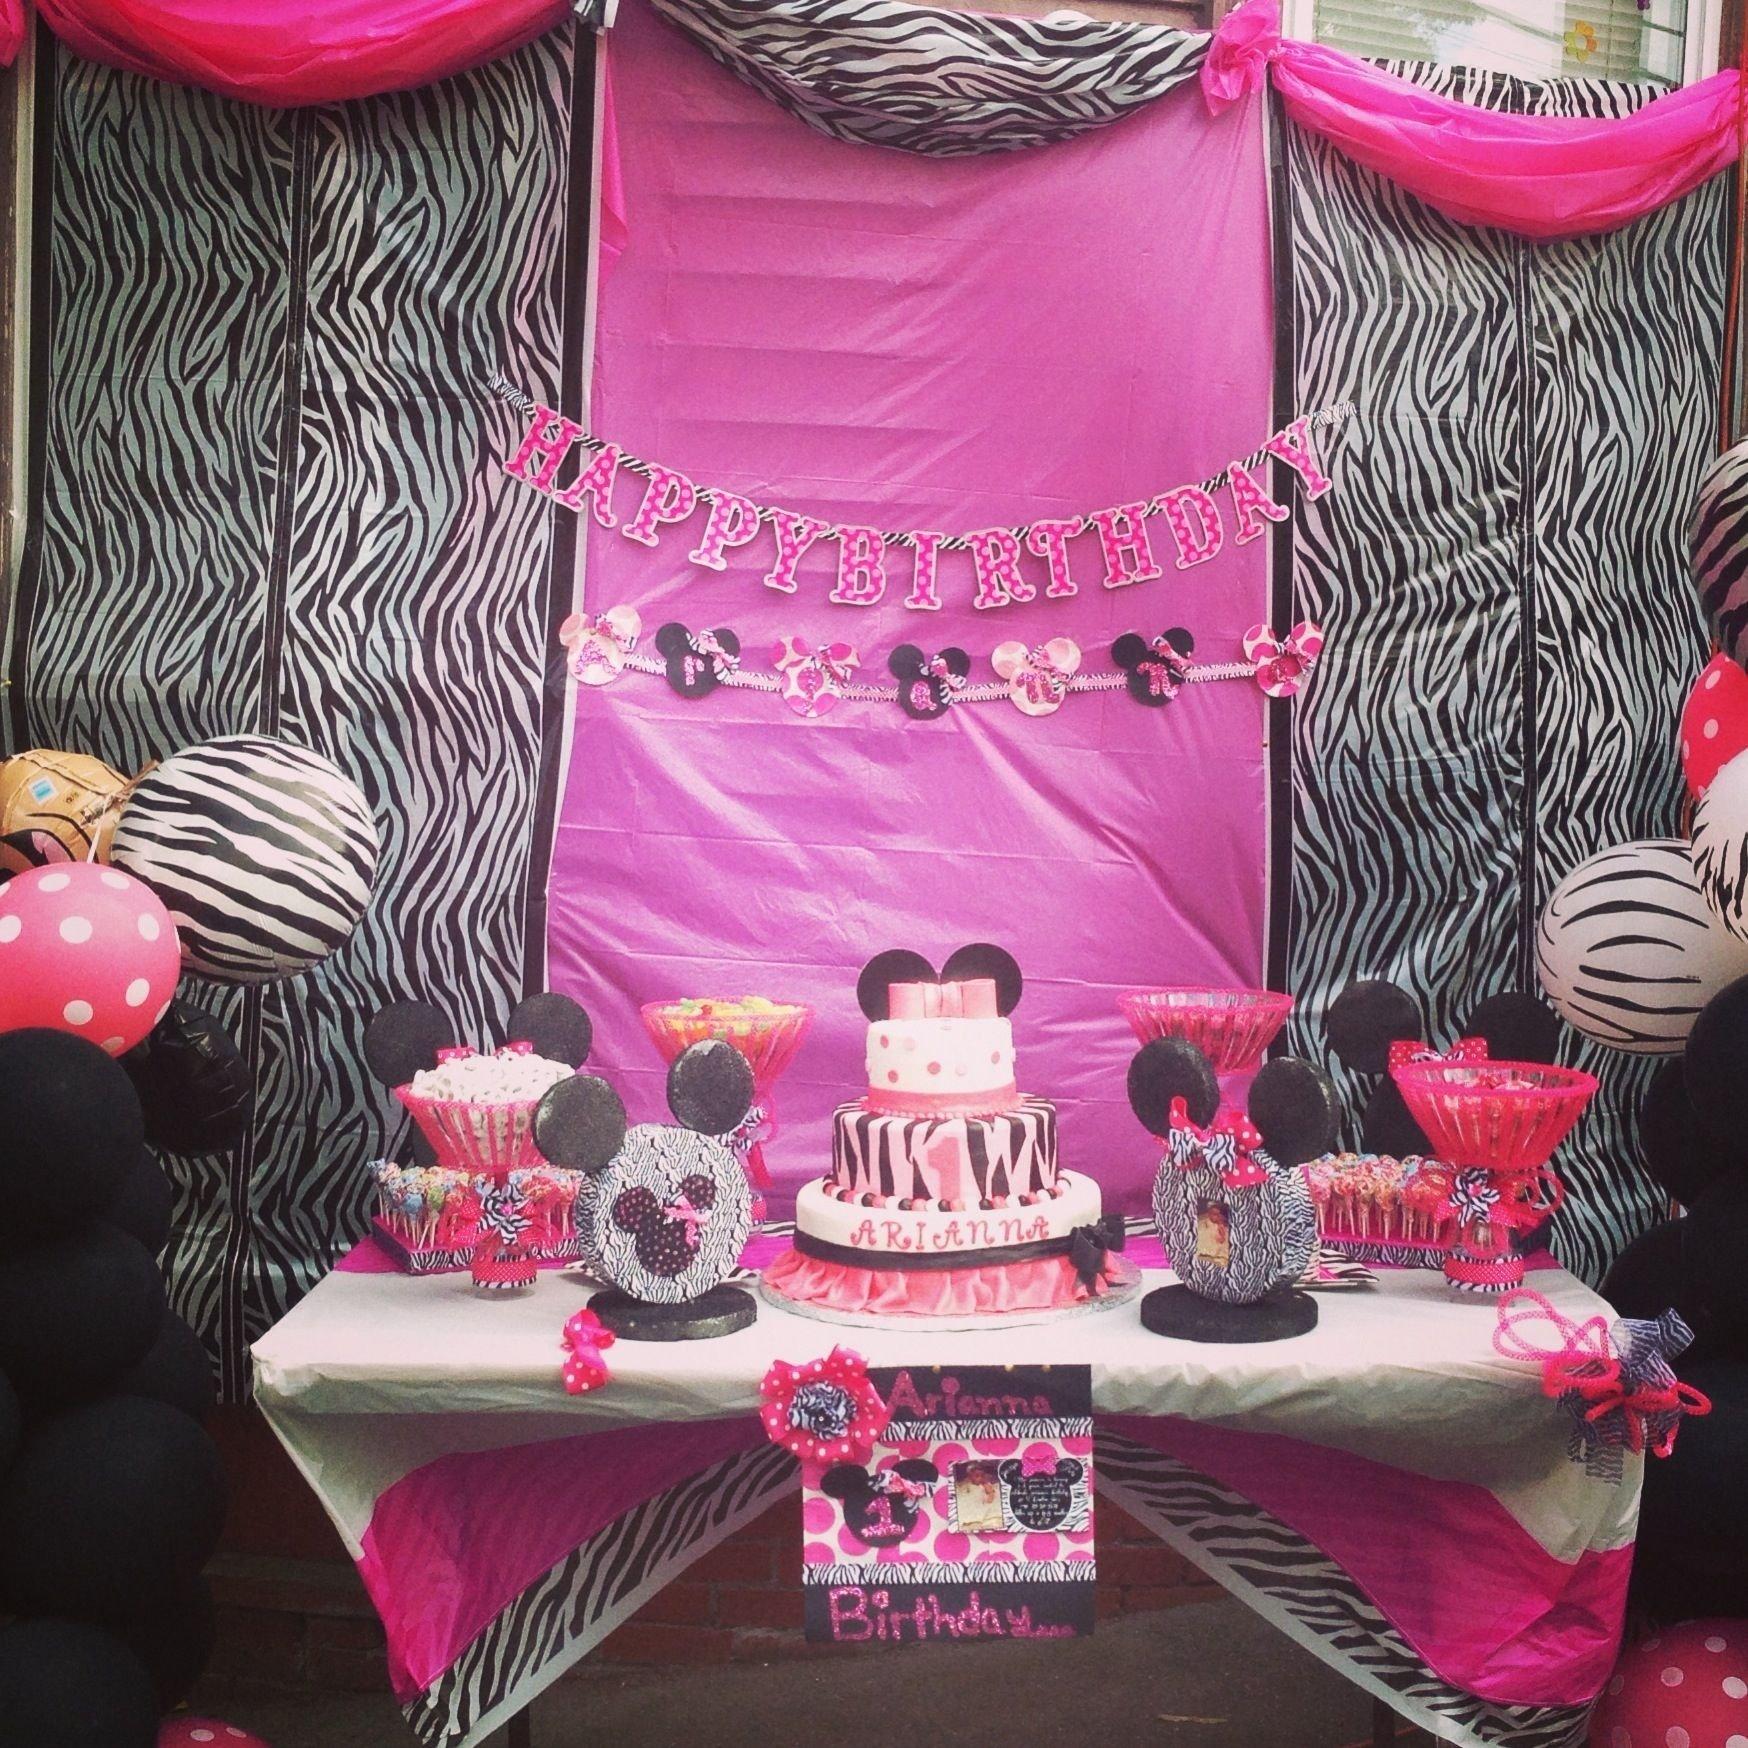 10 Spectacular Zebra Print Party Decoration Ideas my minnie mouse with zebra print party for my princess arianna 3 2021